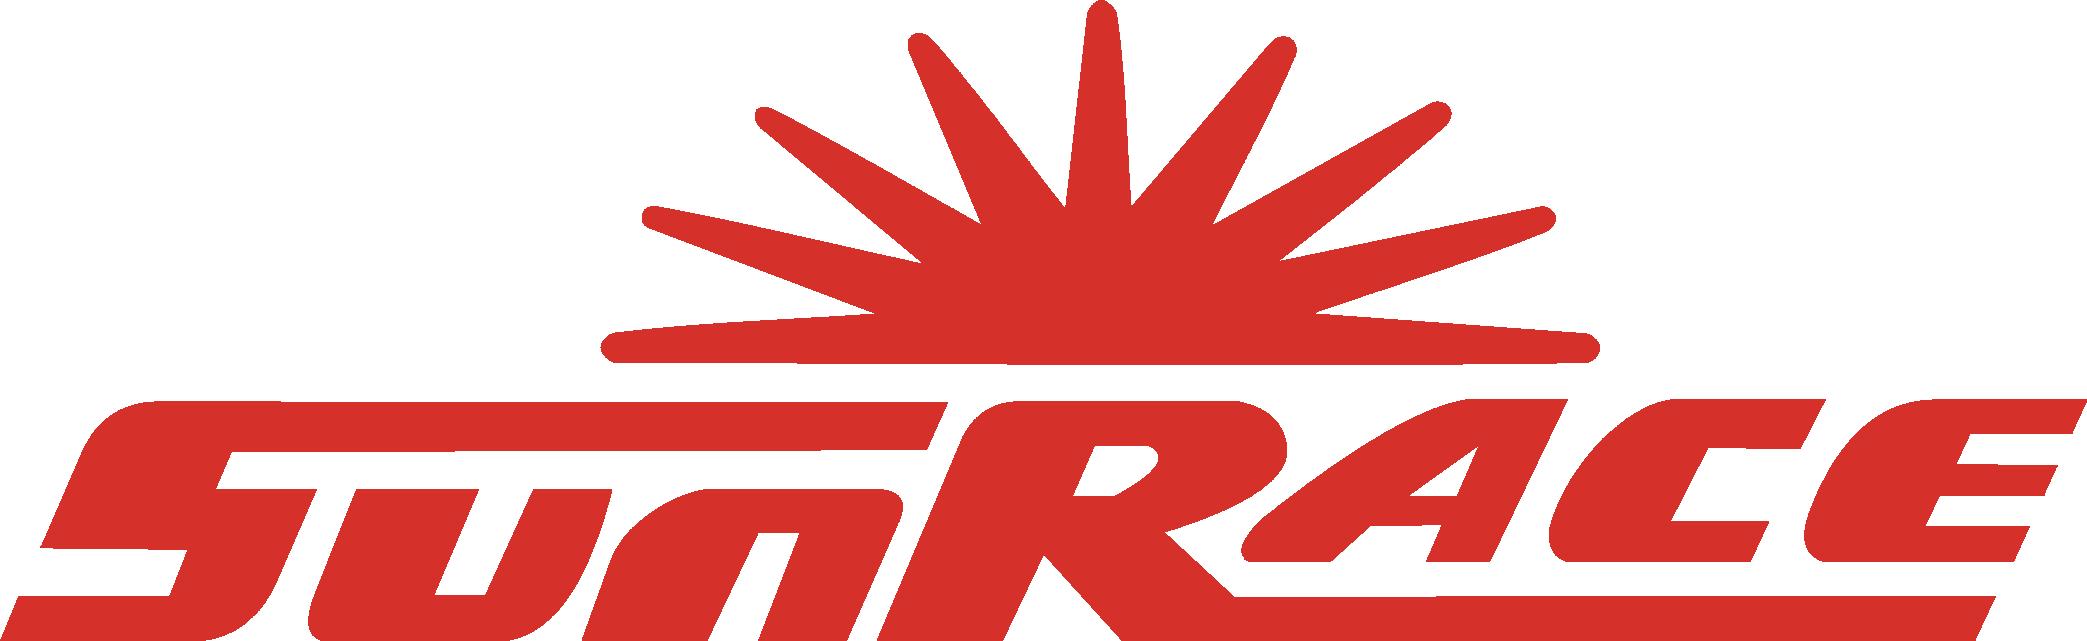 Image result for sunrace logo